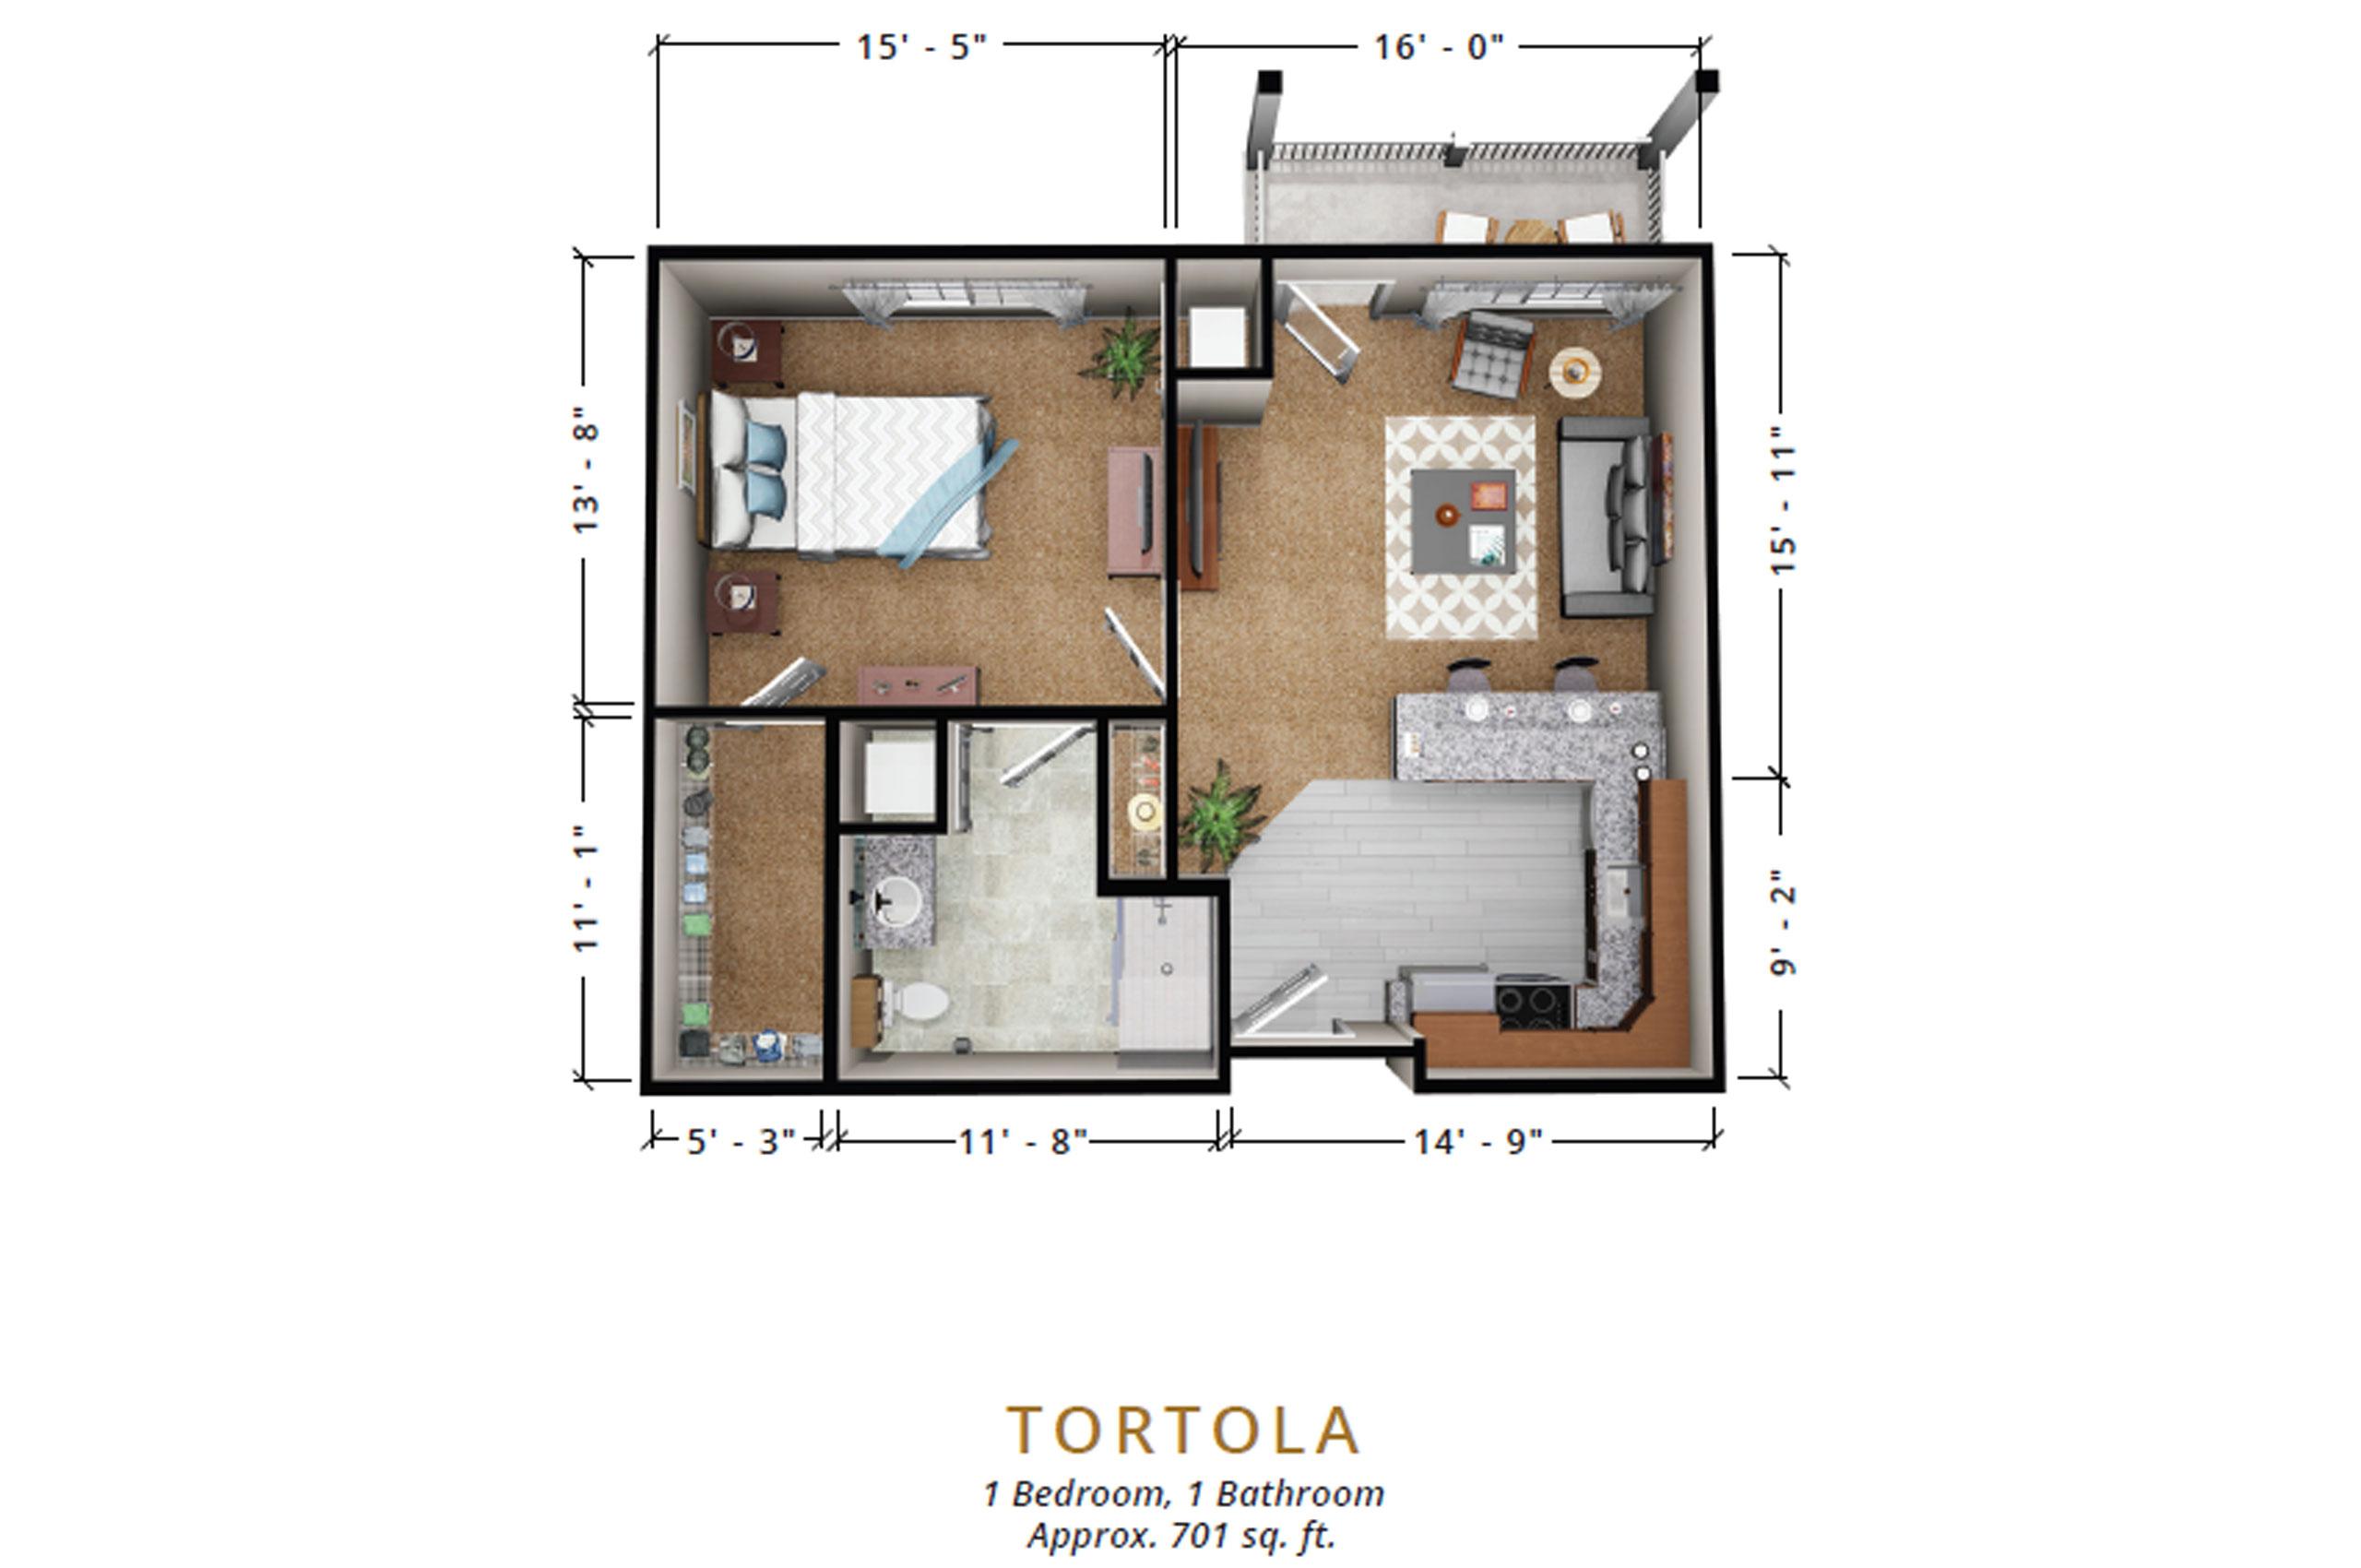 Tortola | One Bedroom